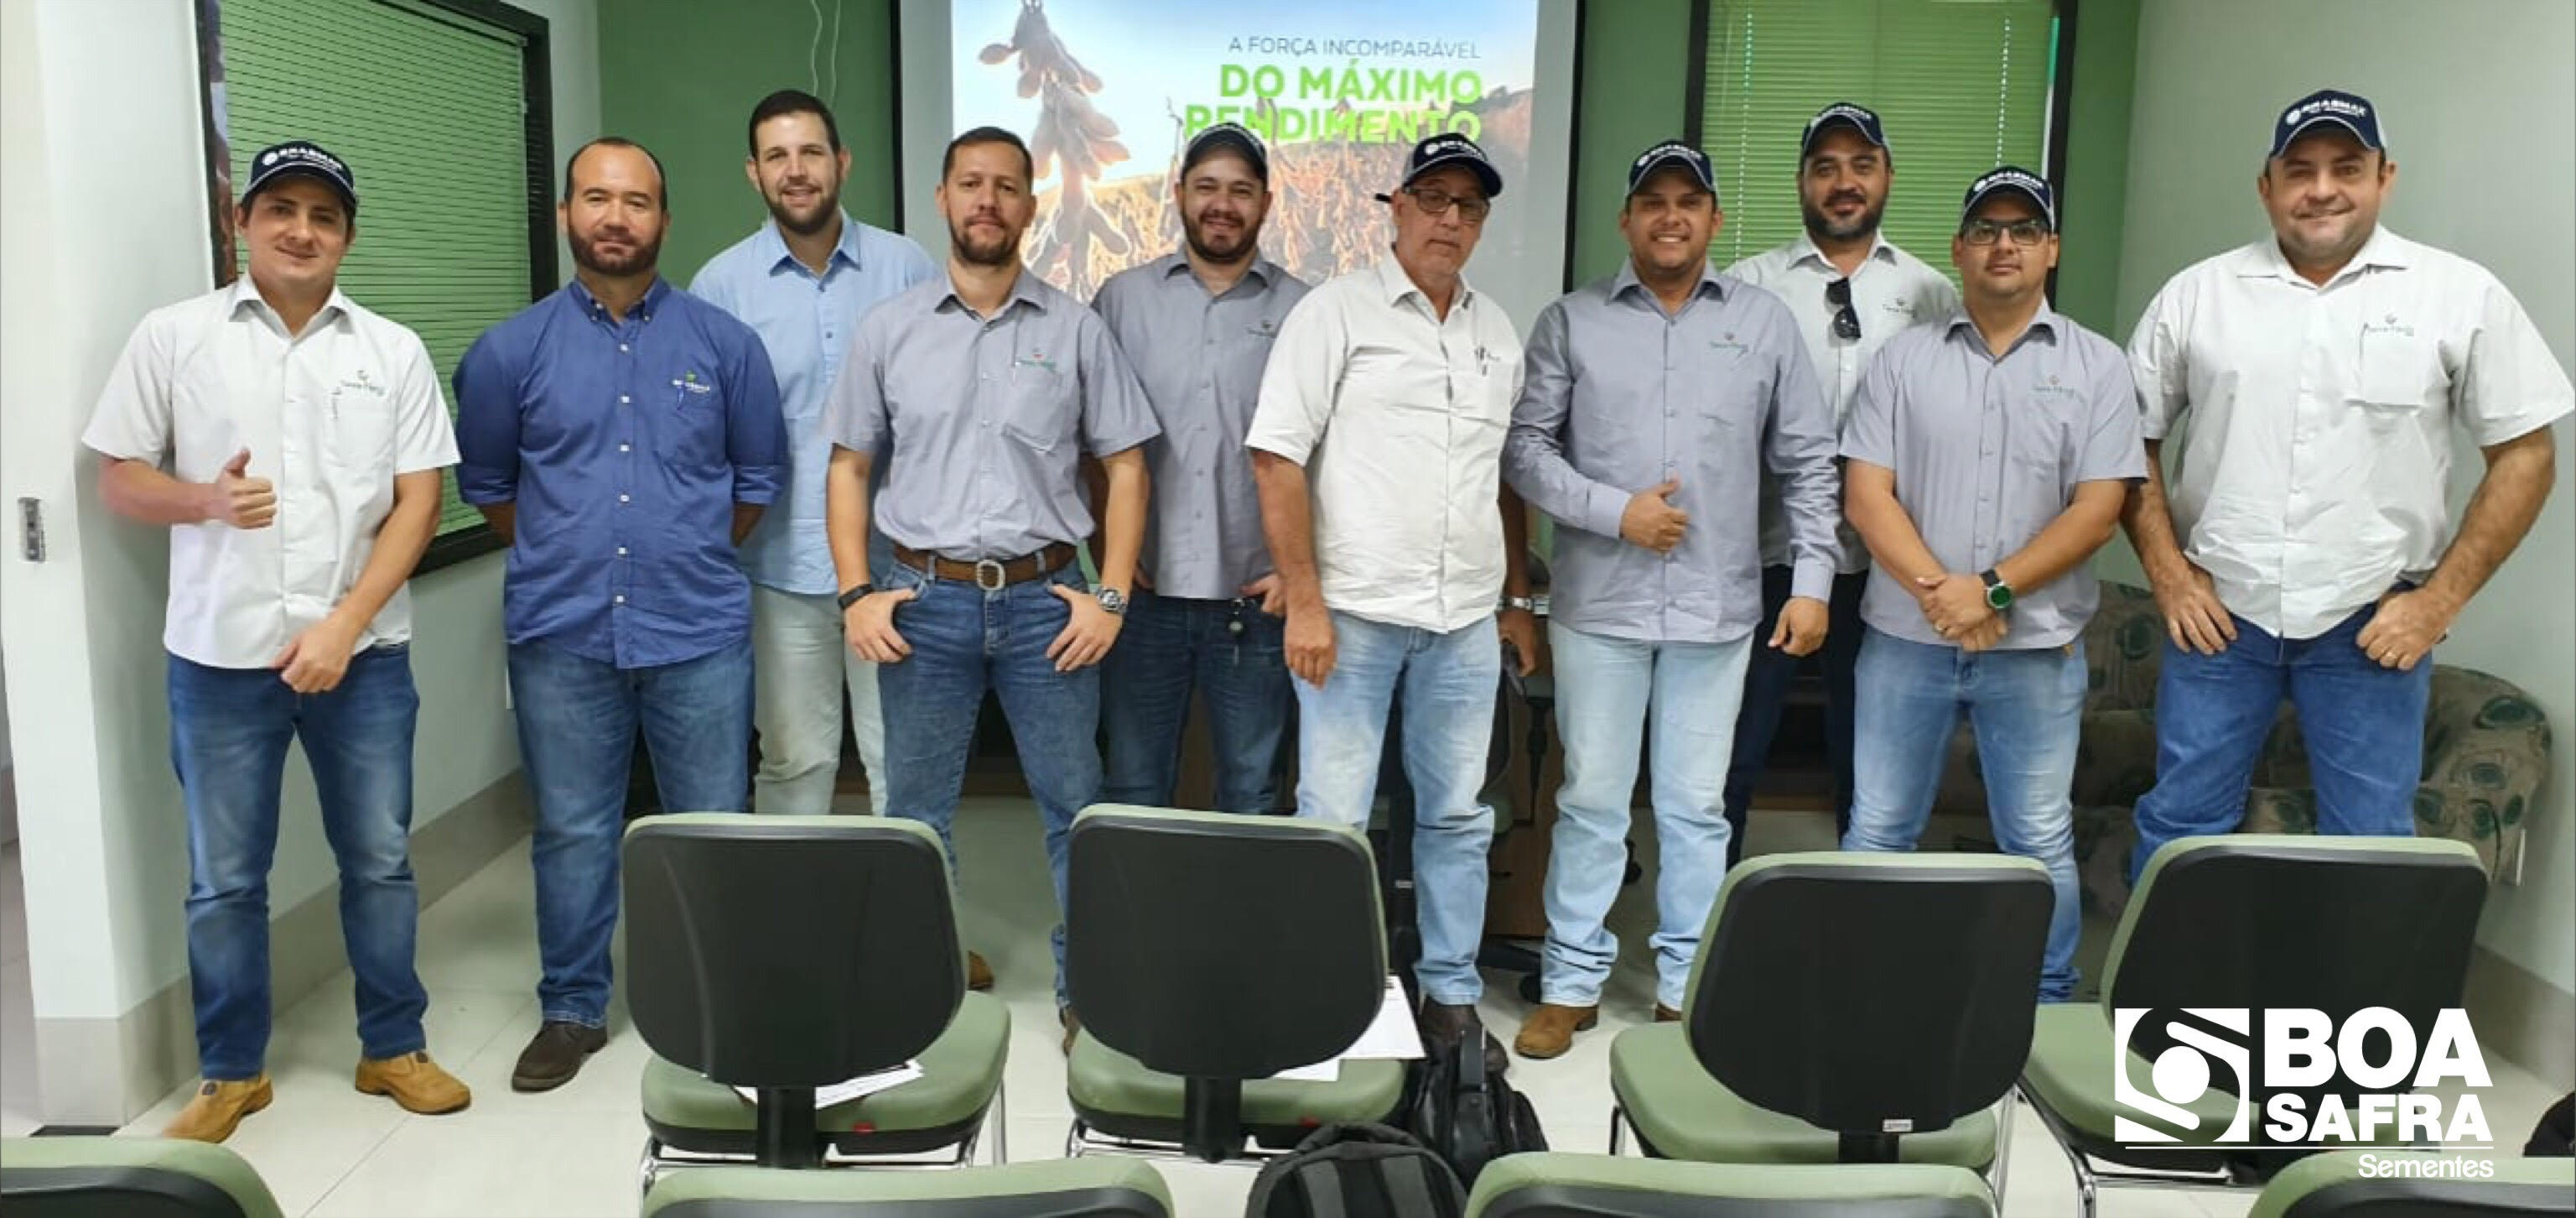 Boa Safra realiza treinamento técnico na revenda Terra Fértil Agro